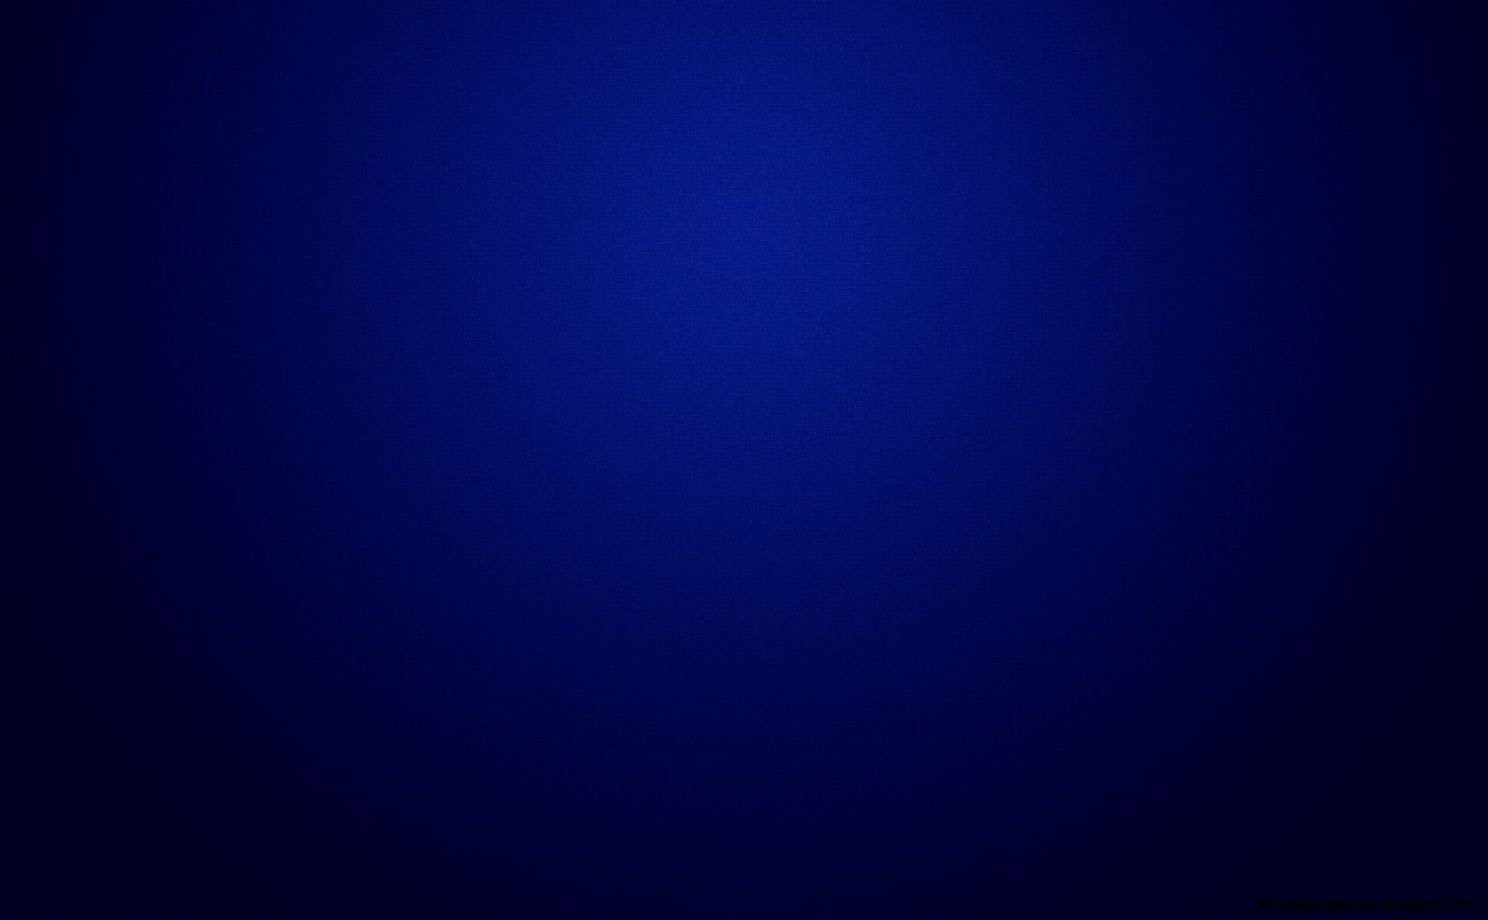 dark-blue-wallpaper-hd-1996-wallpaper - Dartmouth Pub